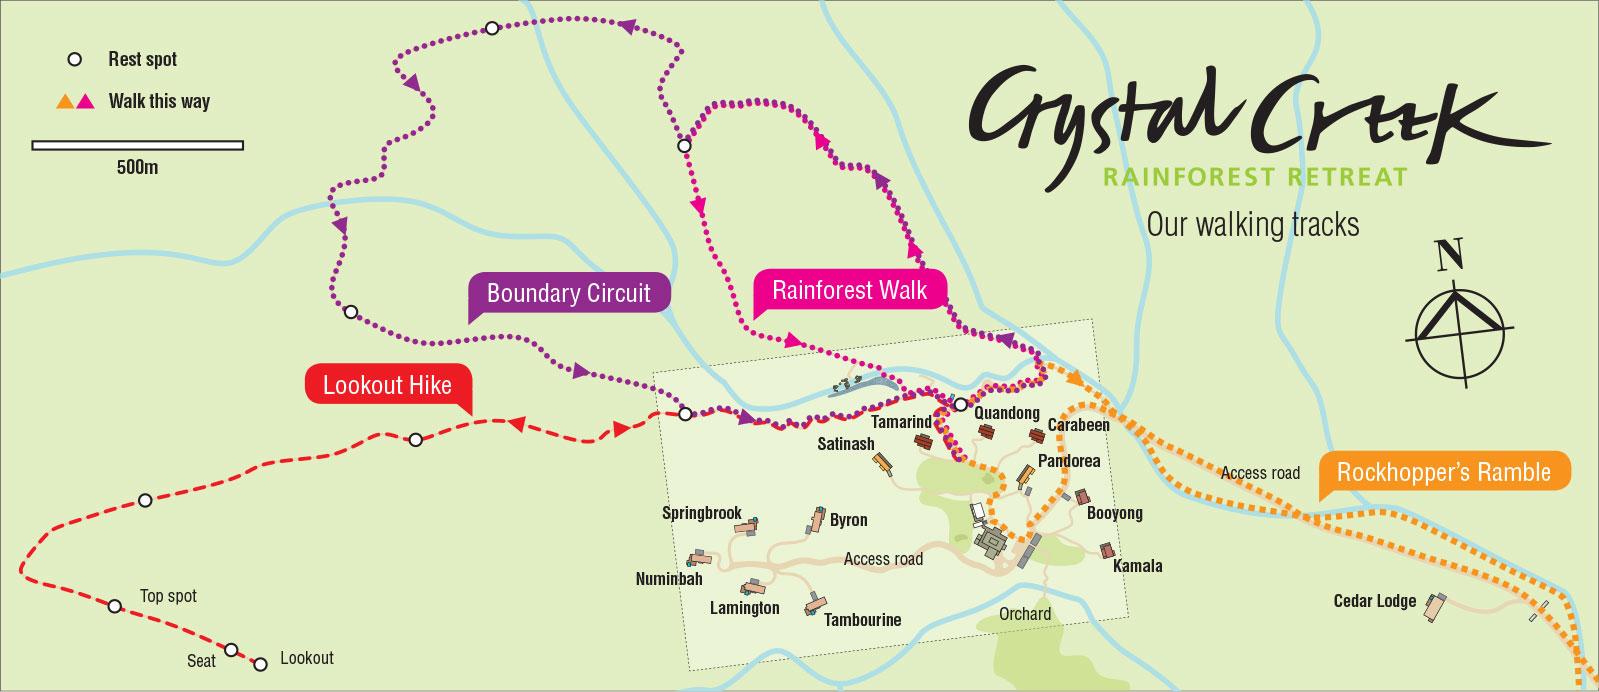 8 kilometres of walking tracks at Crystal Creek Rainforest Retreat